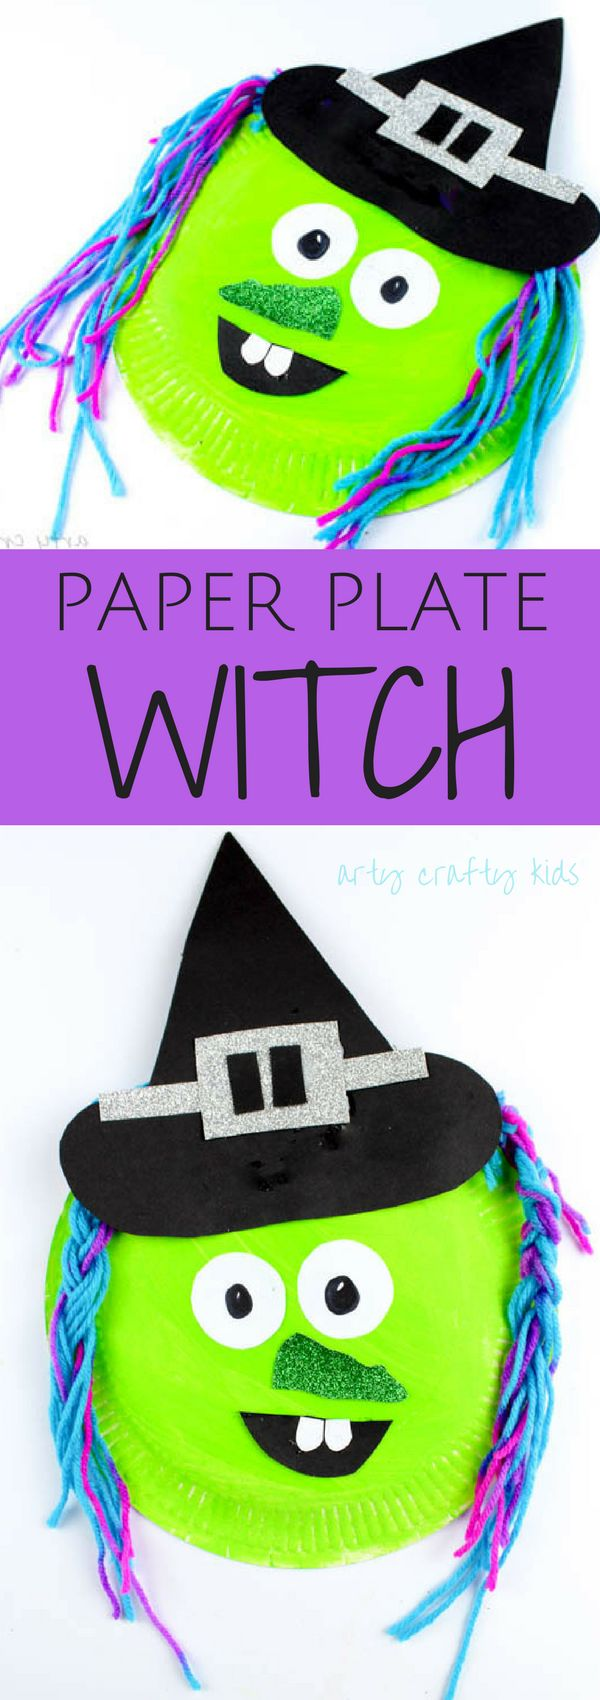 515 best PAPER & PAPER PLATES images on Pinterest | Crafts for kids ...